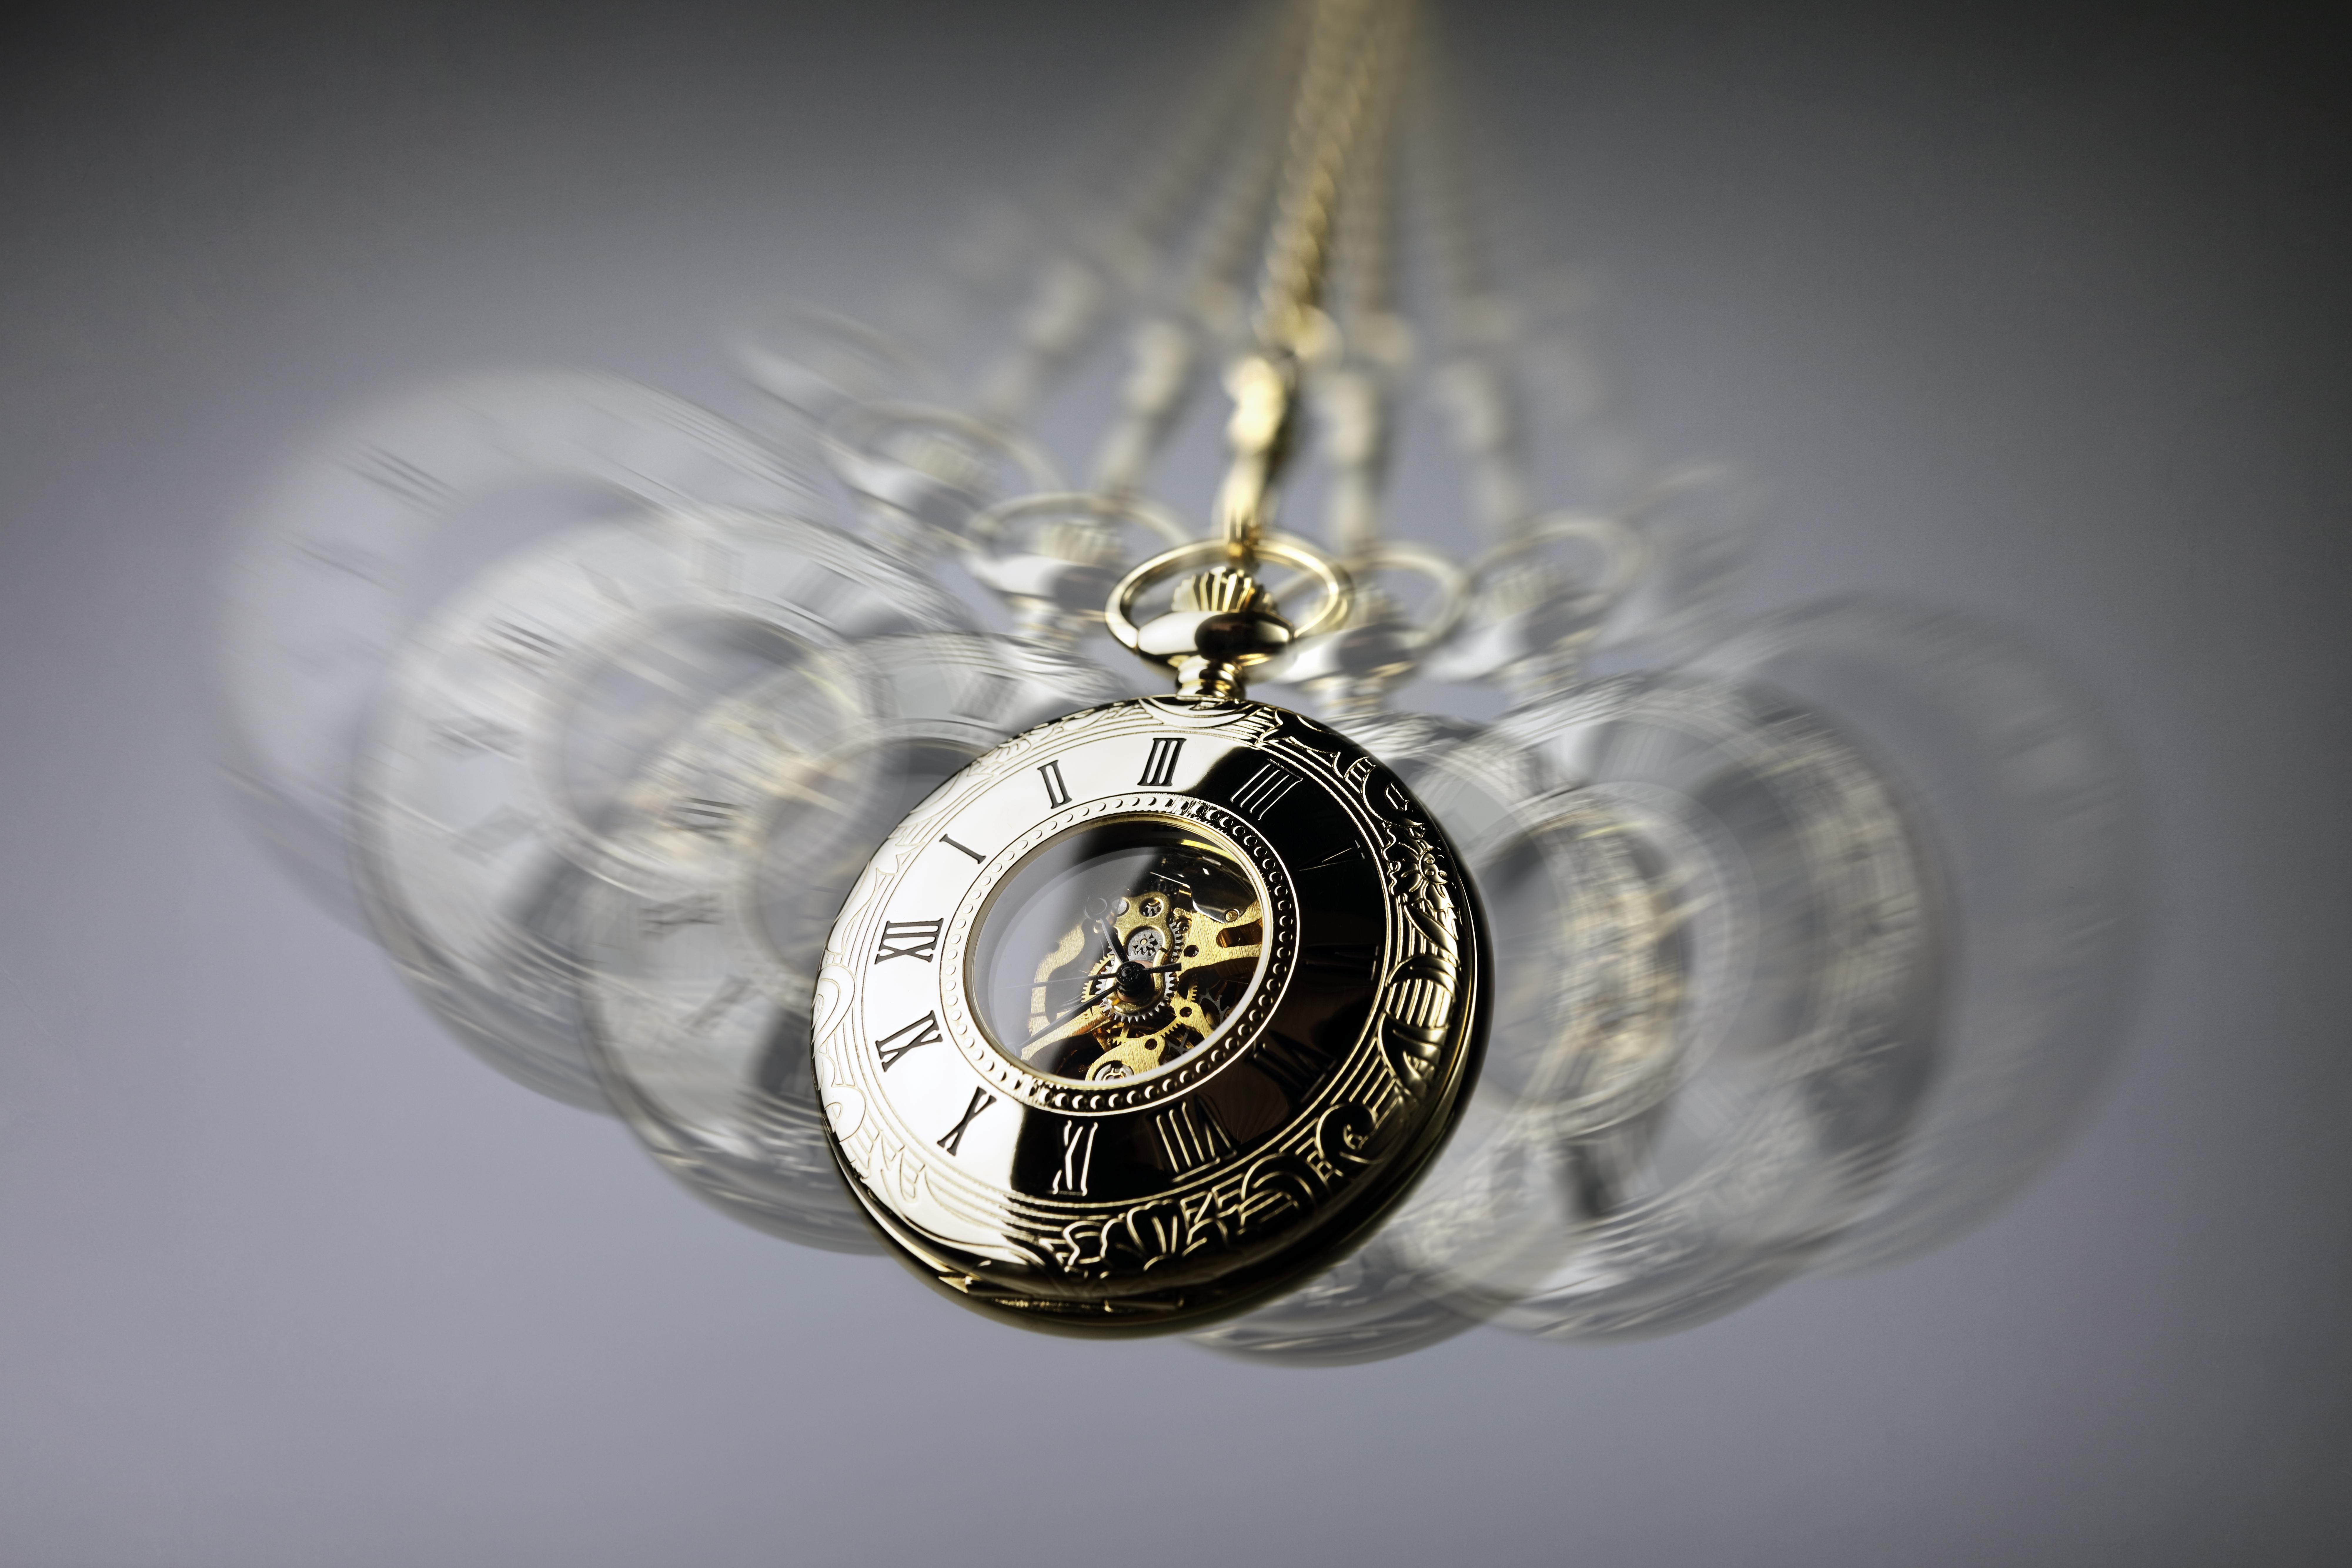 Hypnotism concept, gold pocket watch swi